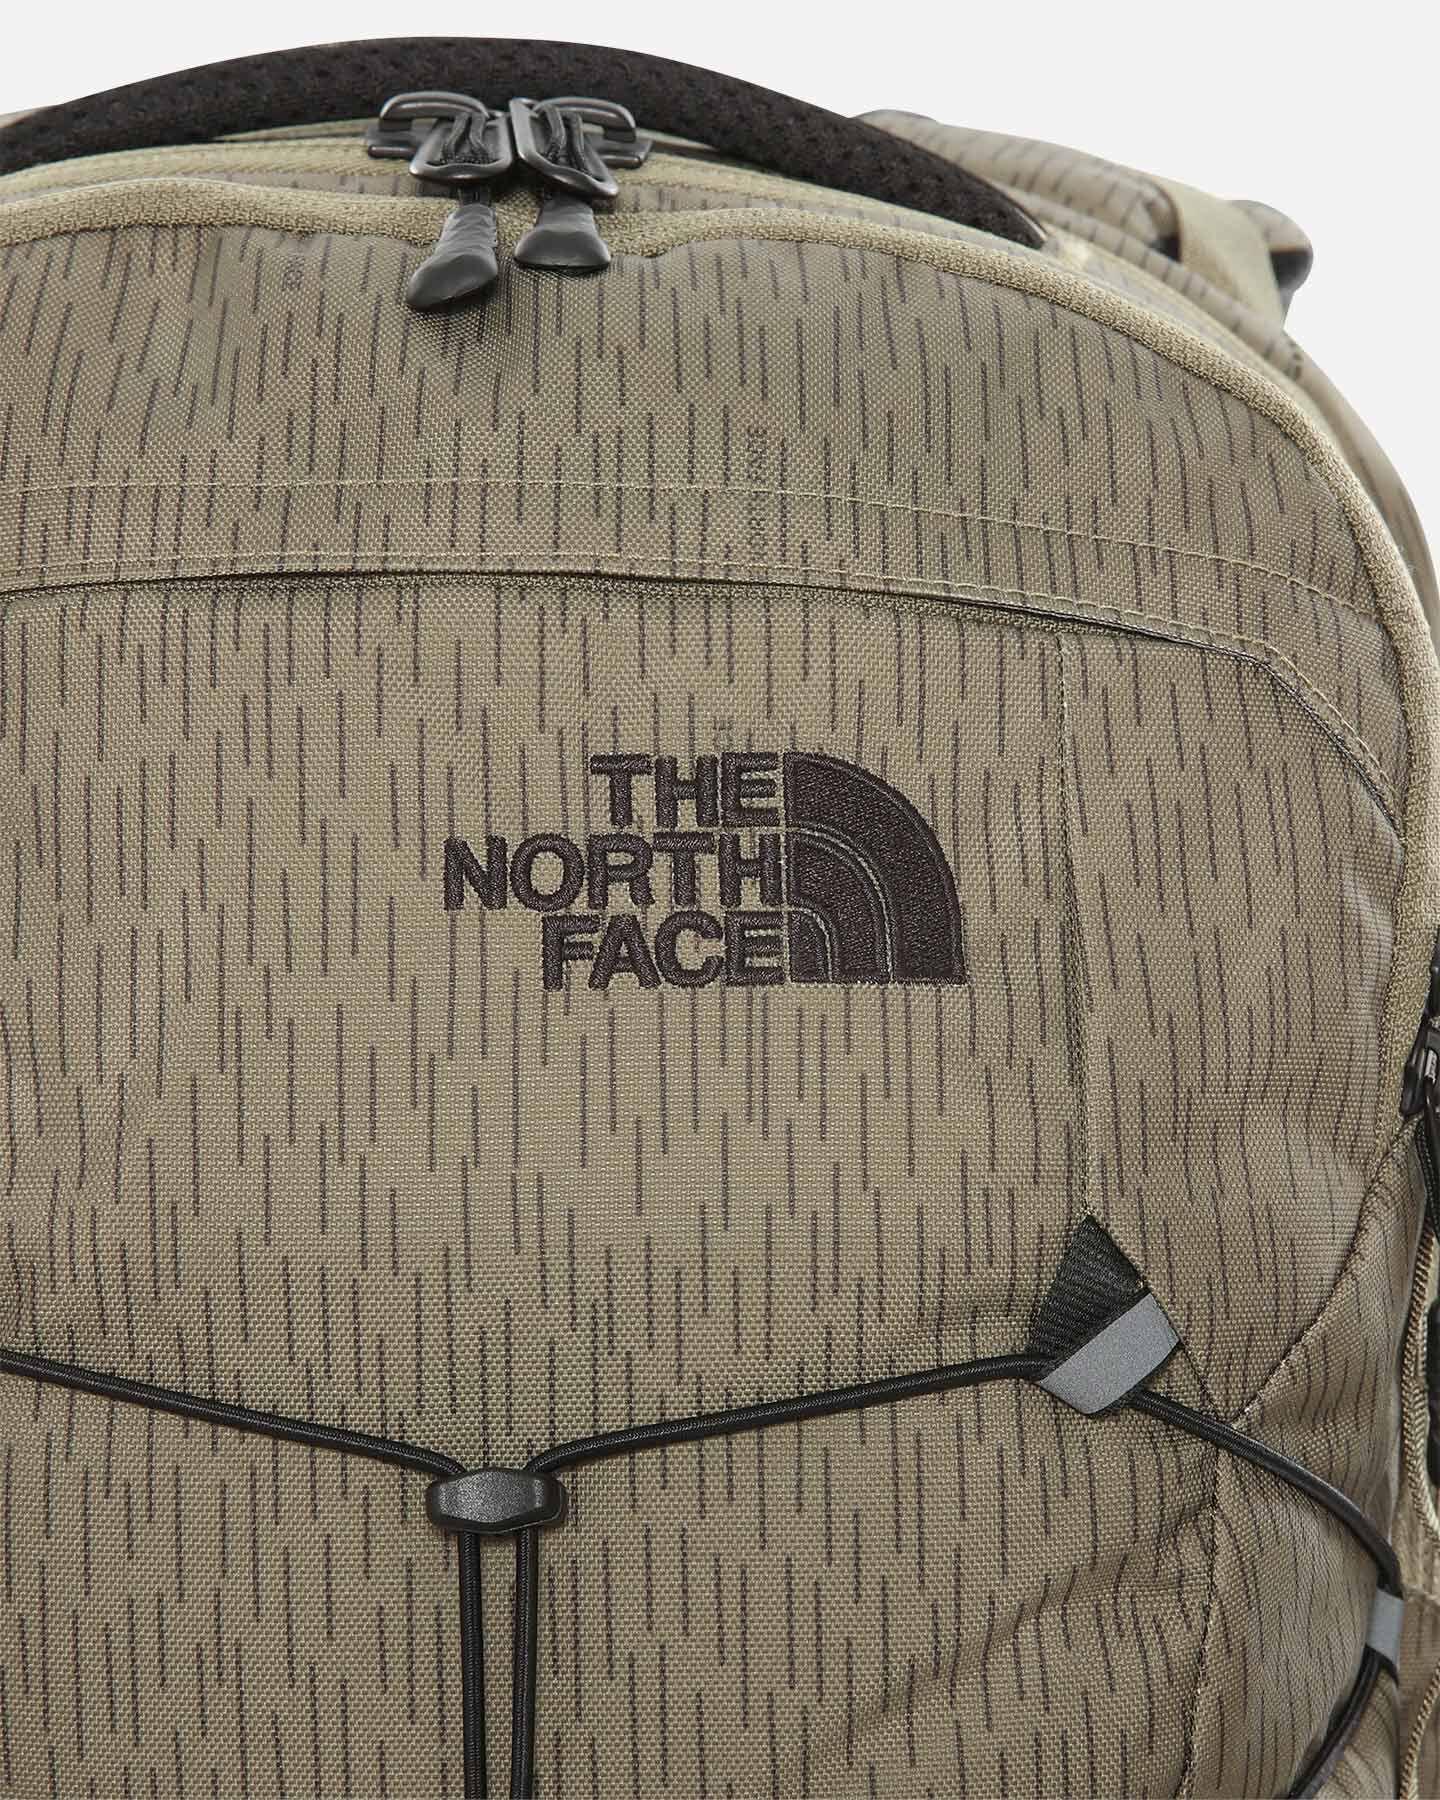 Zaino THE NORTH FACE BOREALIS S5202227|PN5|OS scatto 5